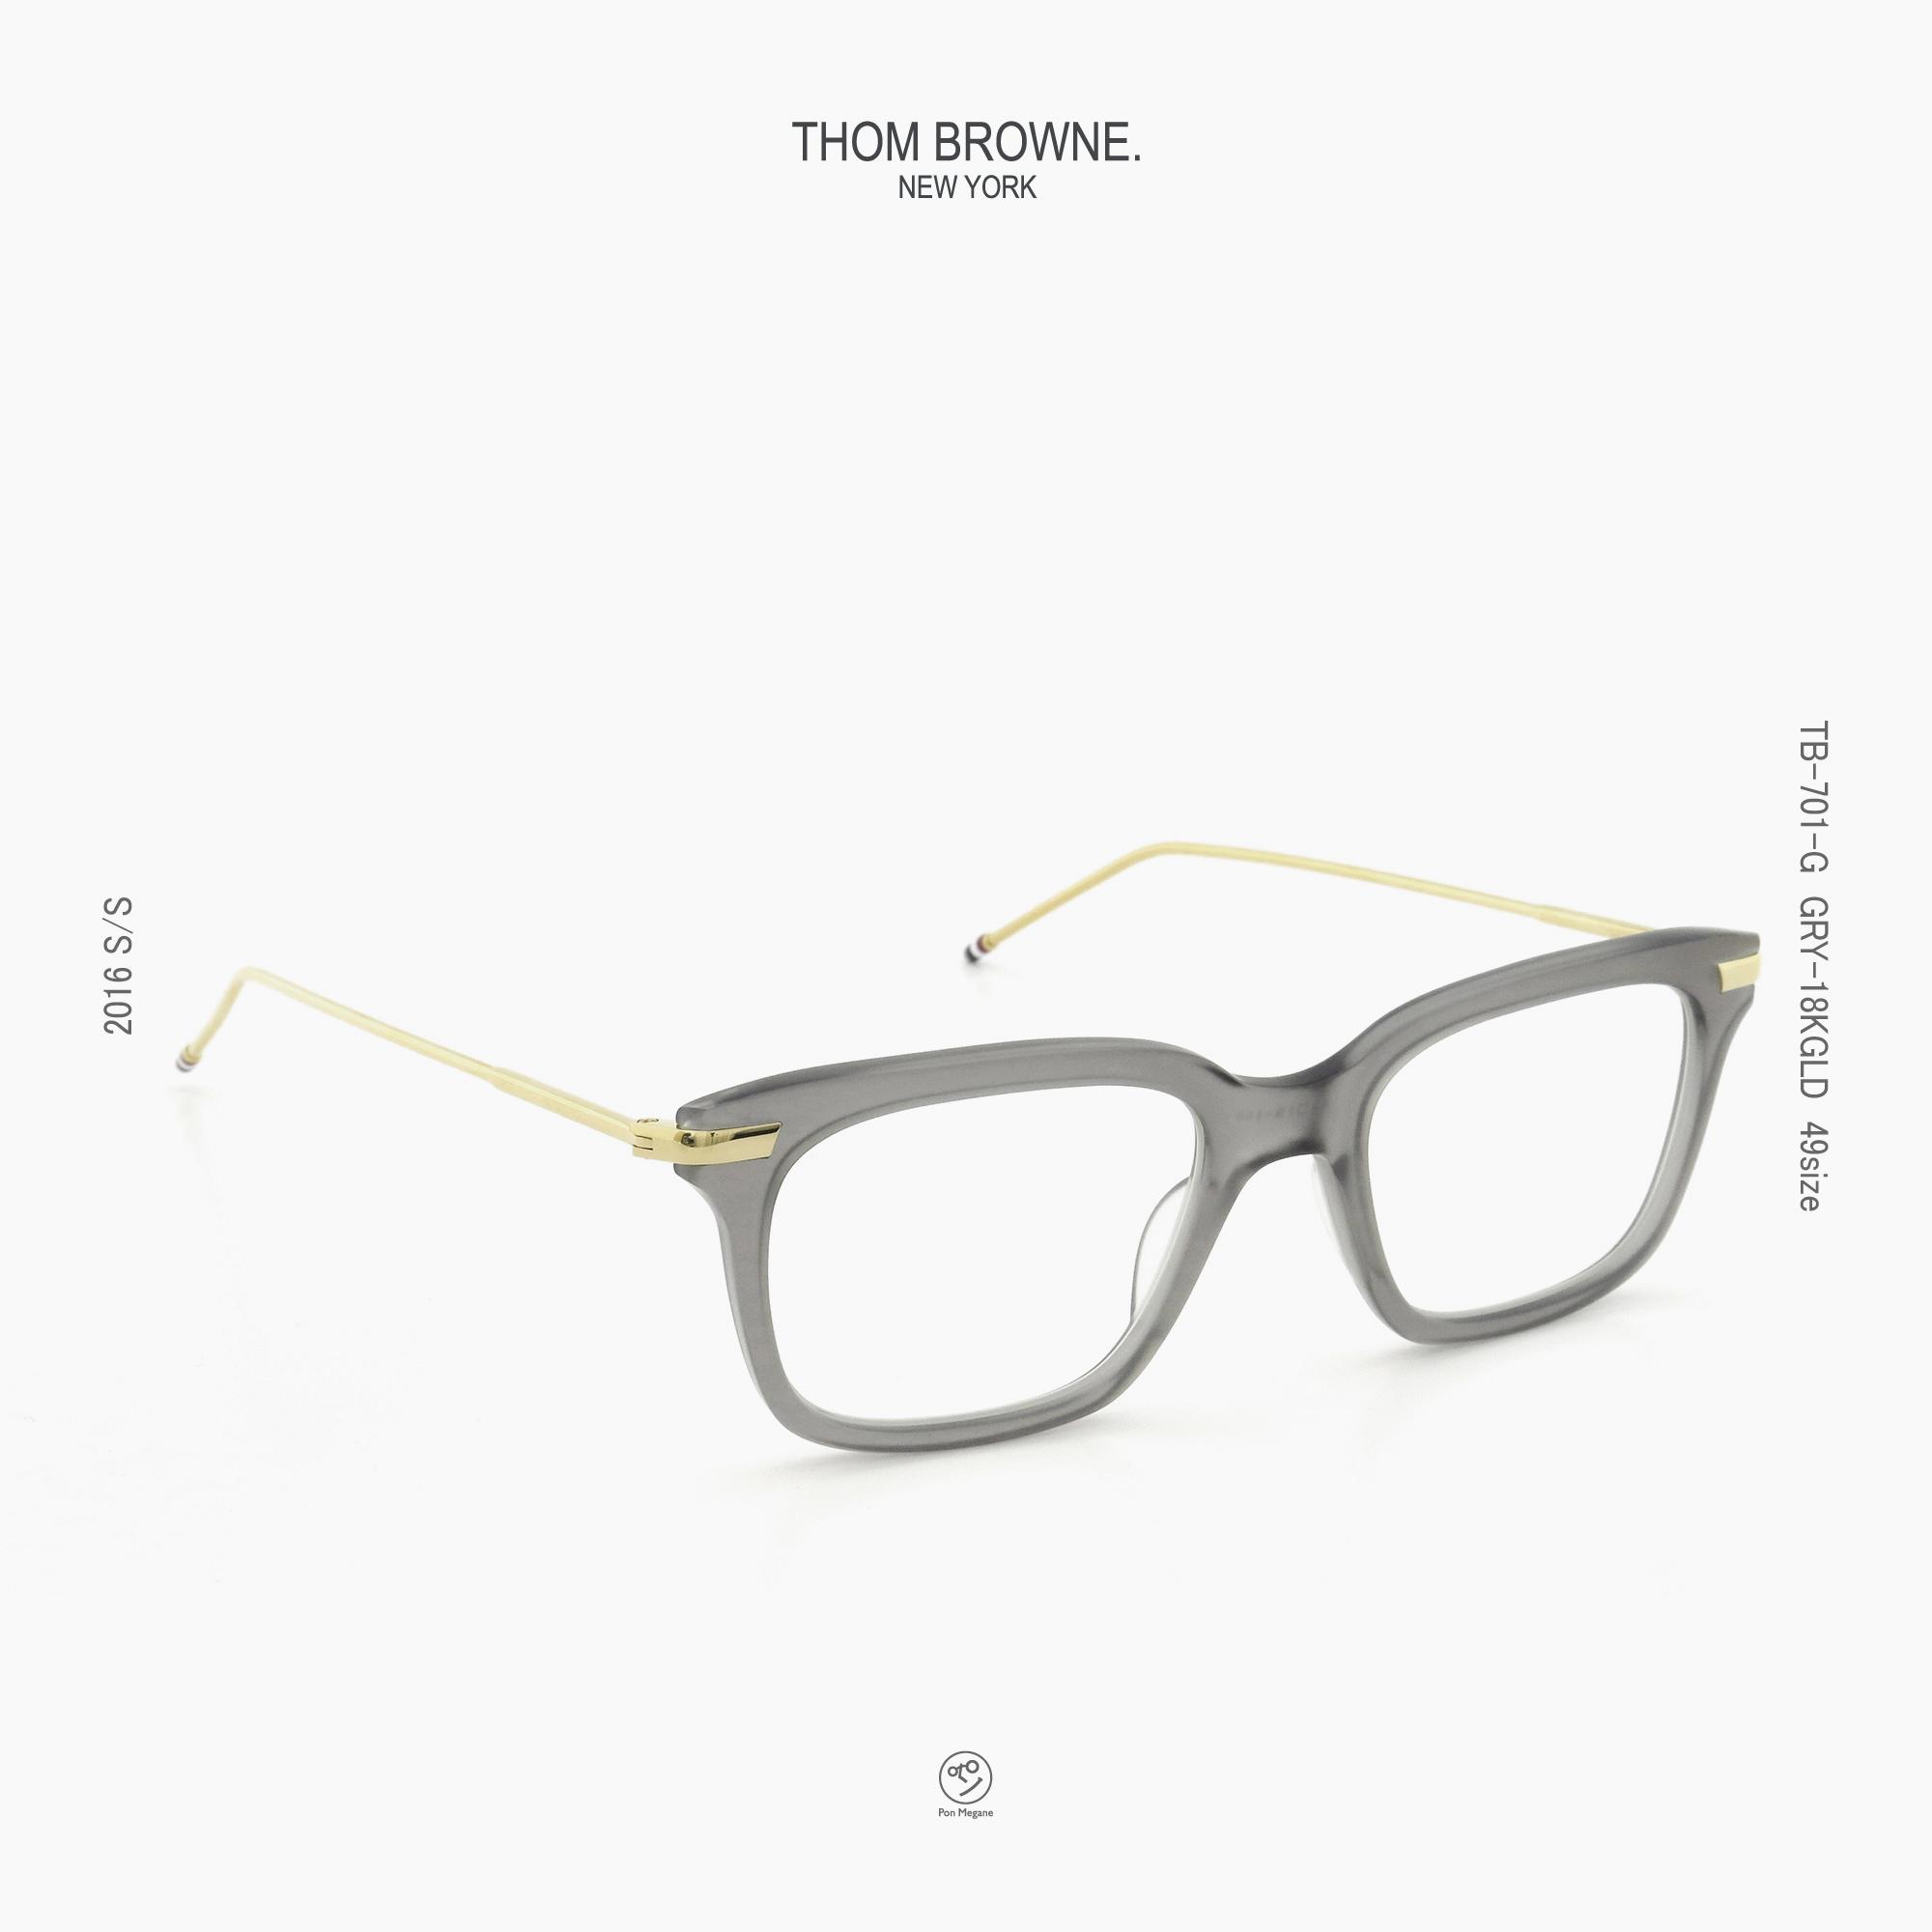 THOM-BROWNE_TB-701-G_GRY-18KGLD_49_insta